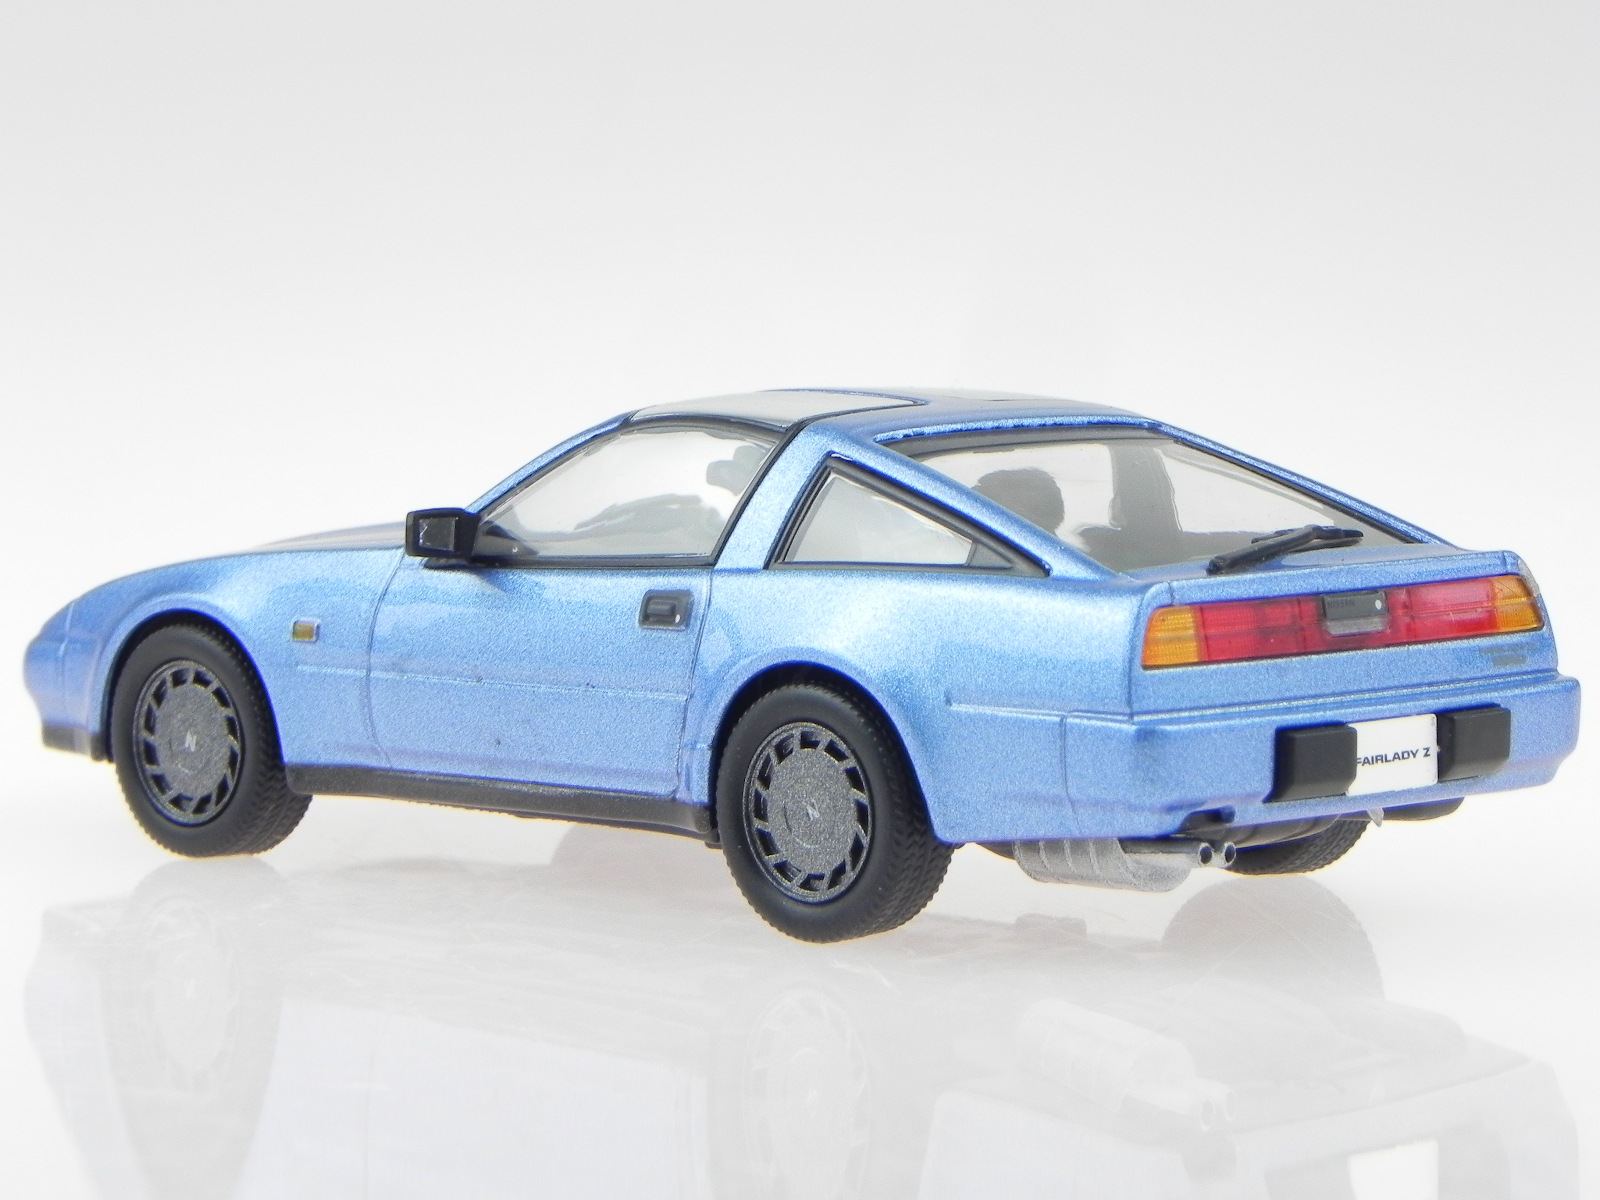 Nissan-300-Fairlady-Z-HZ31-blue-1986-modelcar-03361-Kyosho-1-43